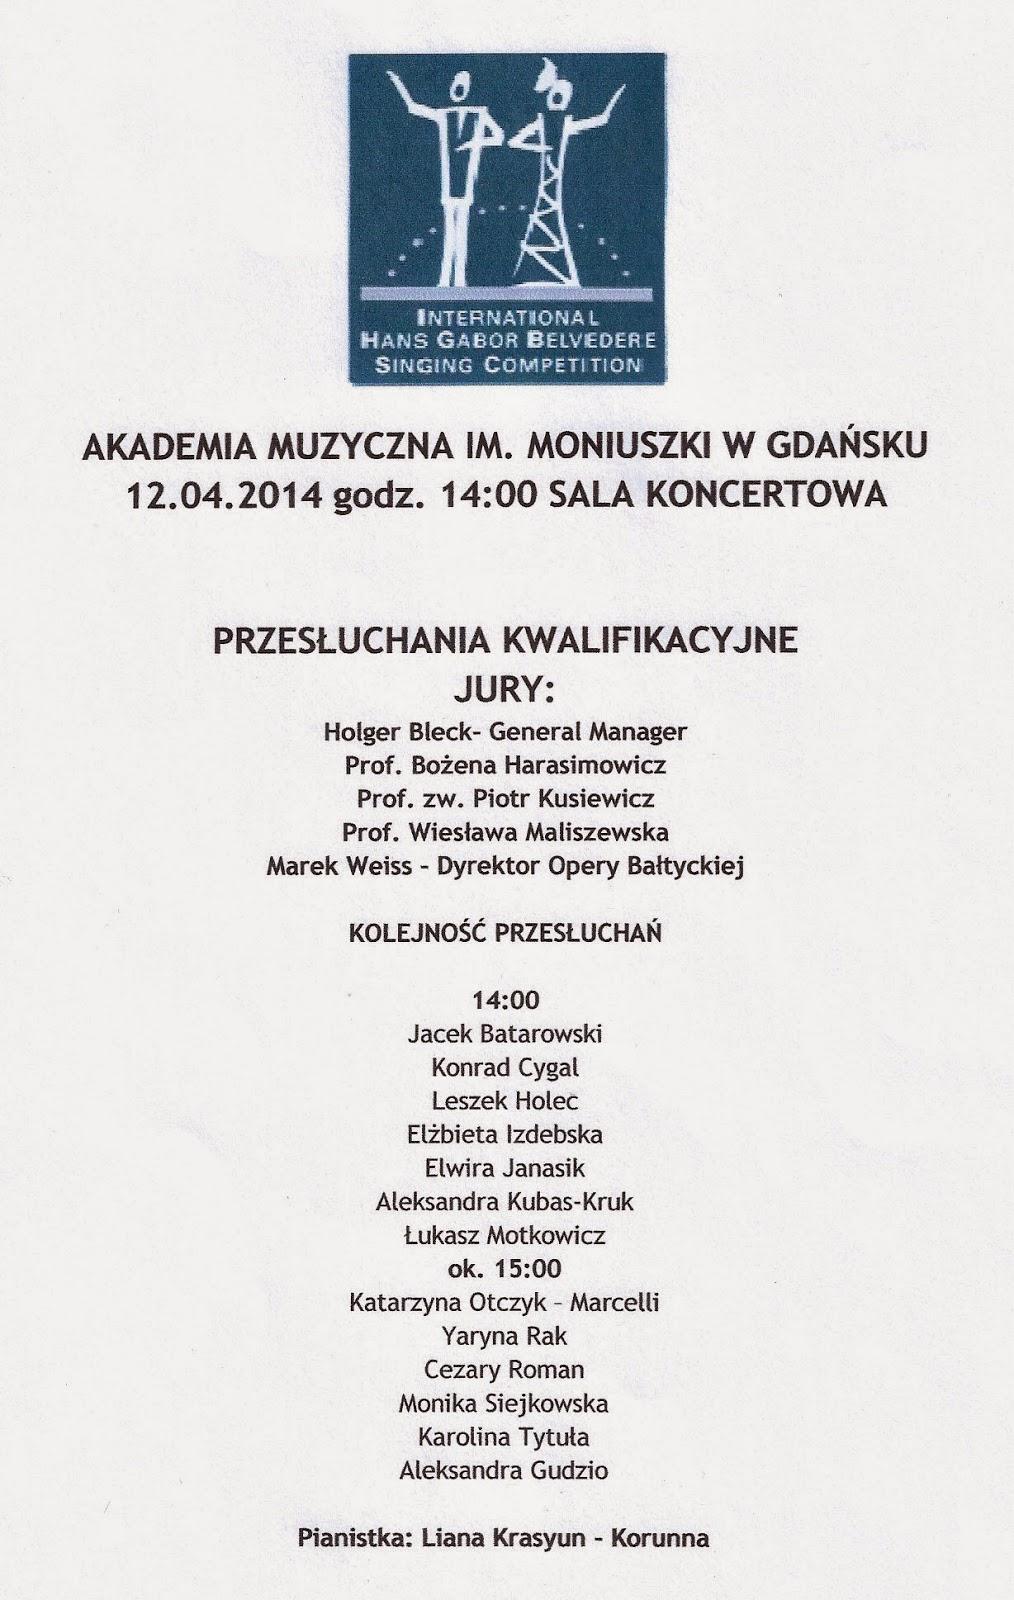 38th International Hans Gabor Belvedere Singing Competition